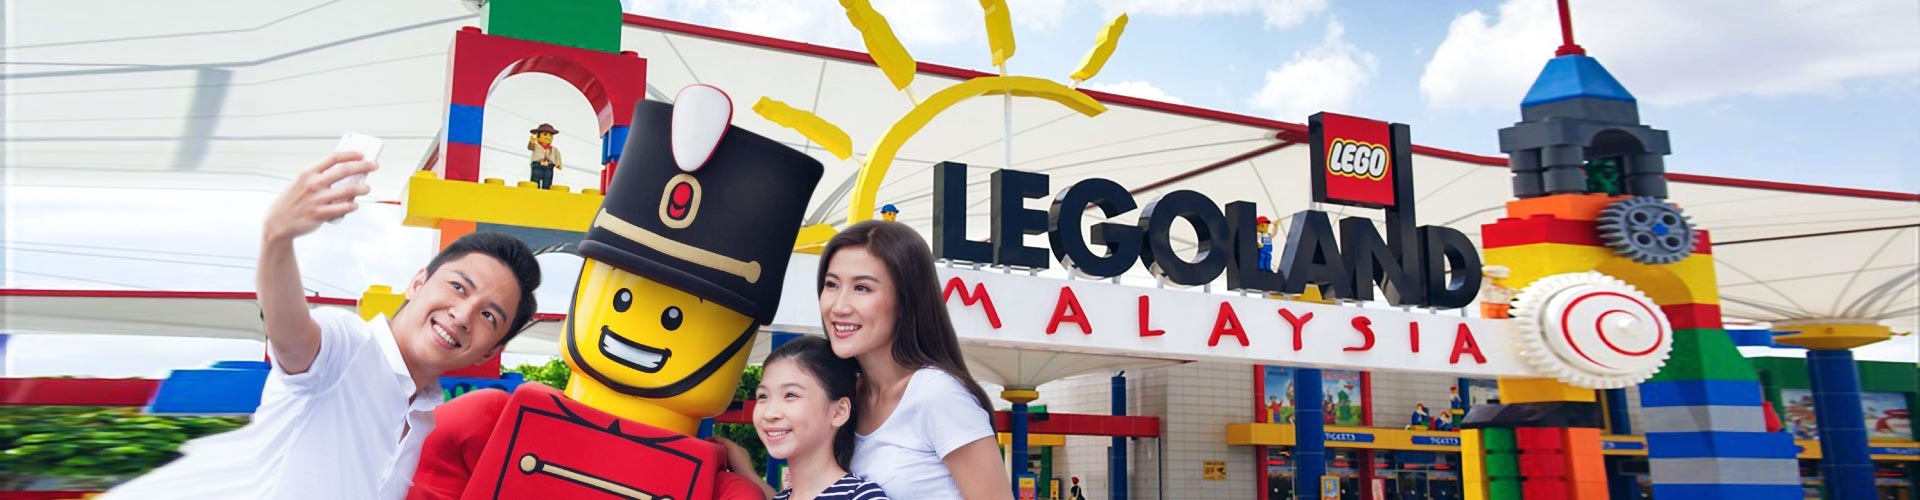 Singapore, Johore Bahru, Desaru, Legoland